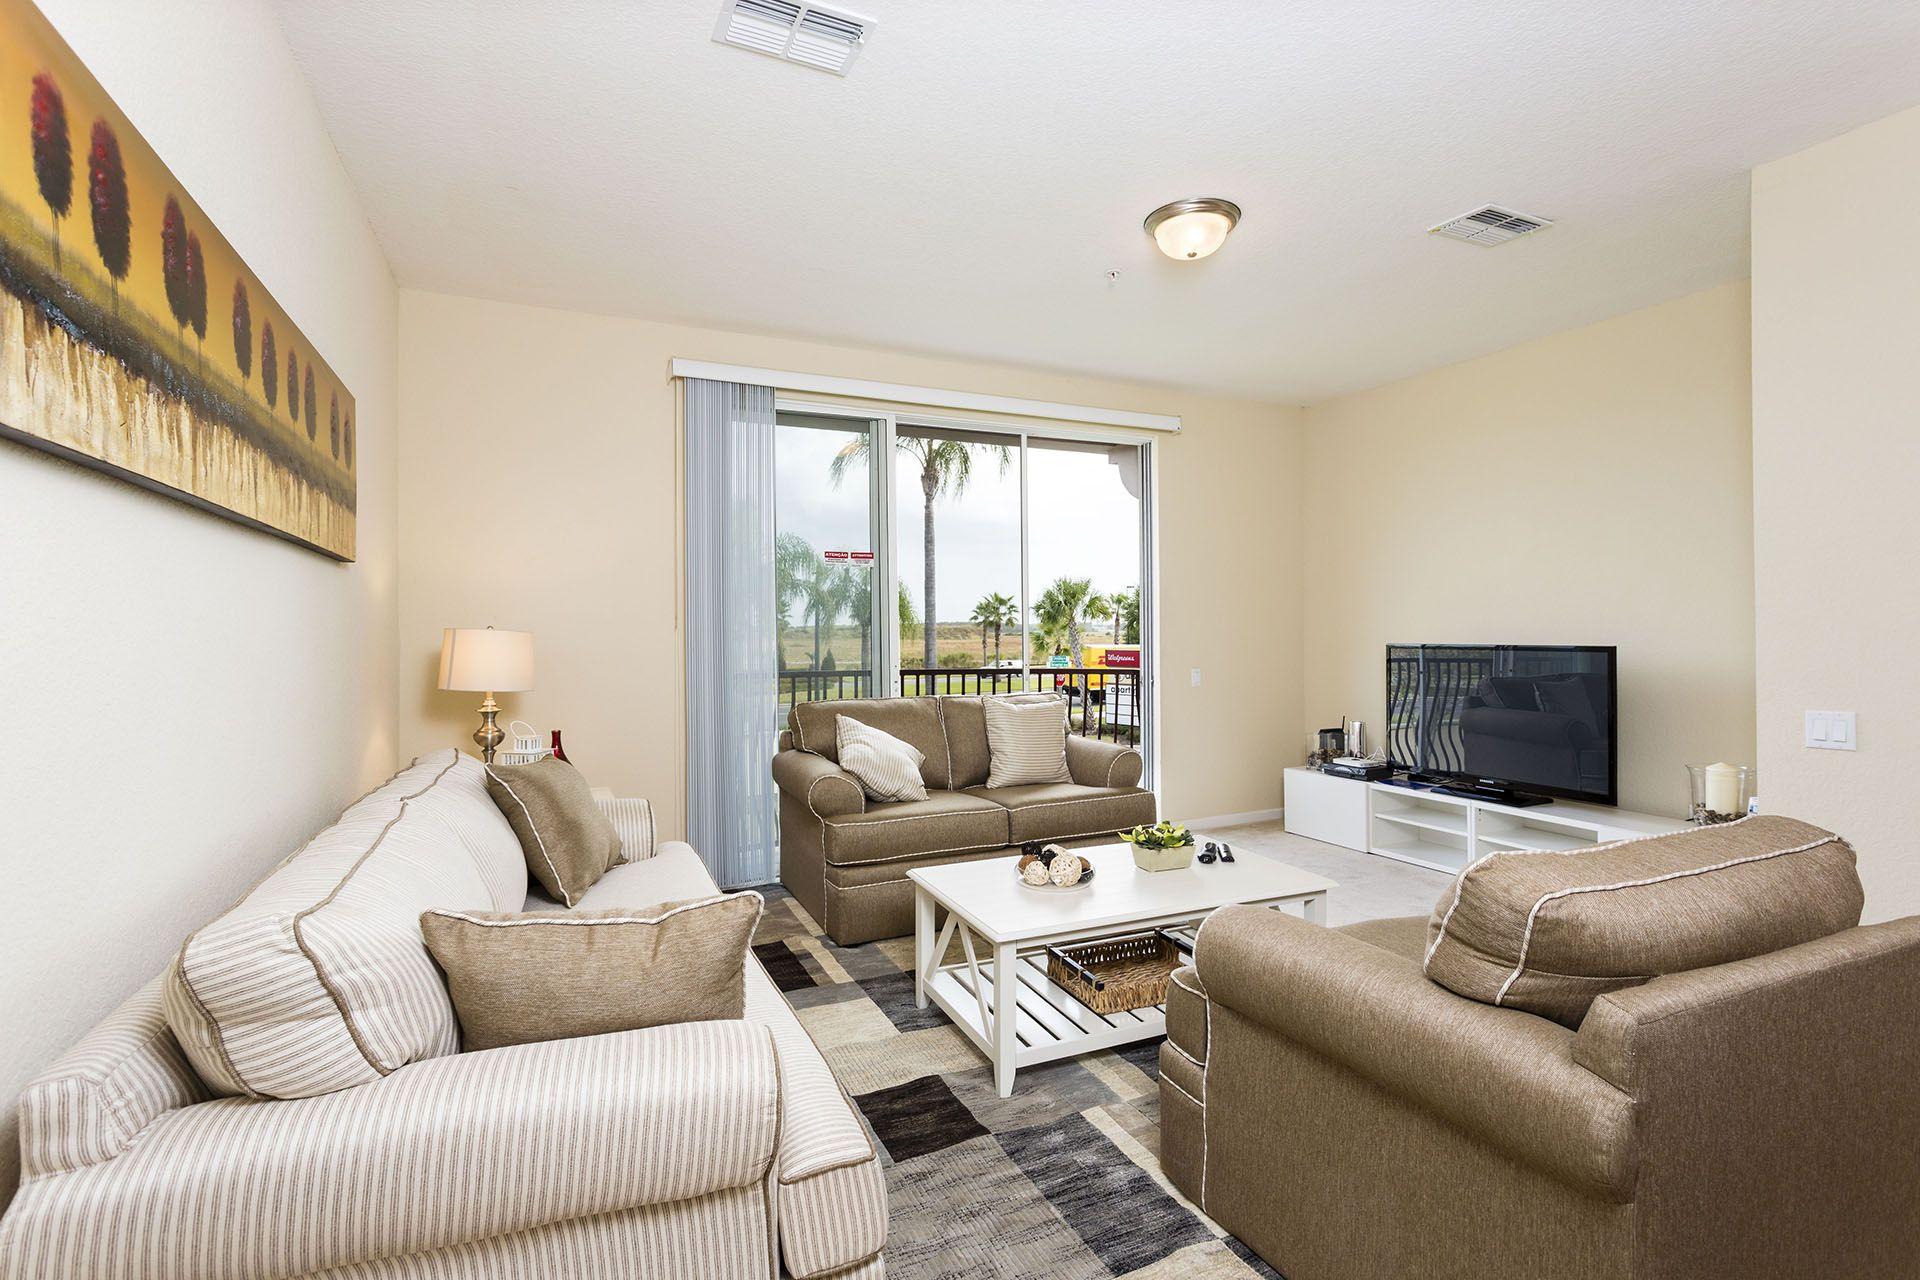 Vista Cay 3 Bedroom TownhomeVC110 vacationrental